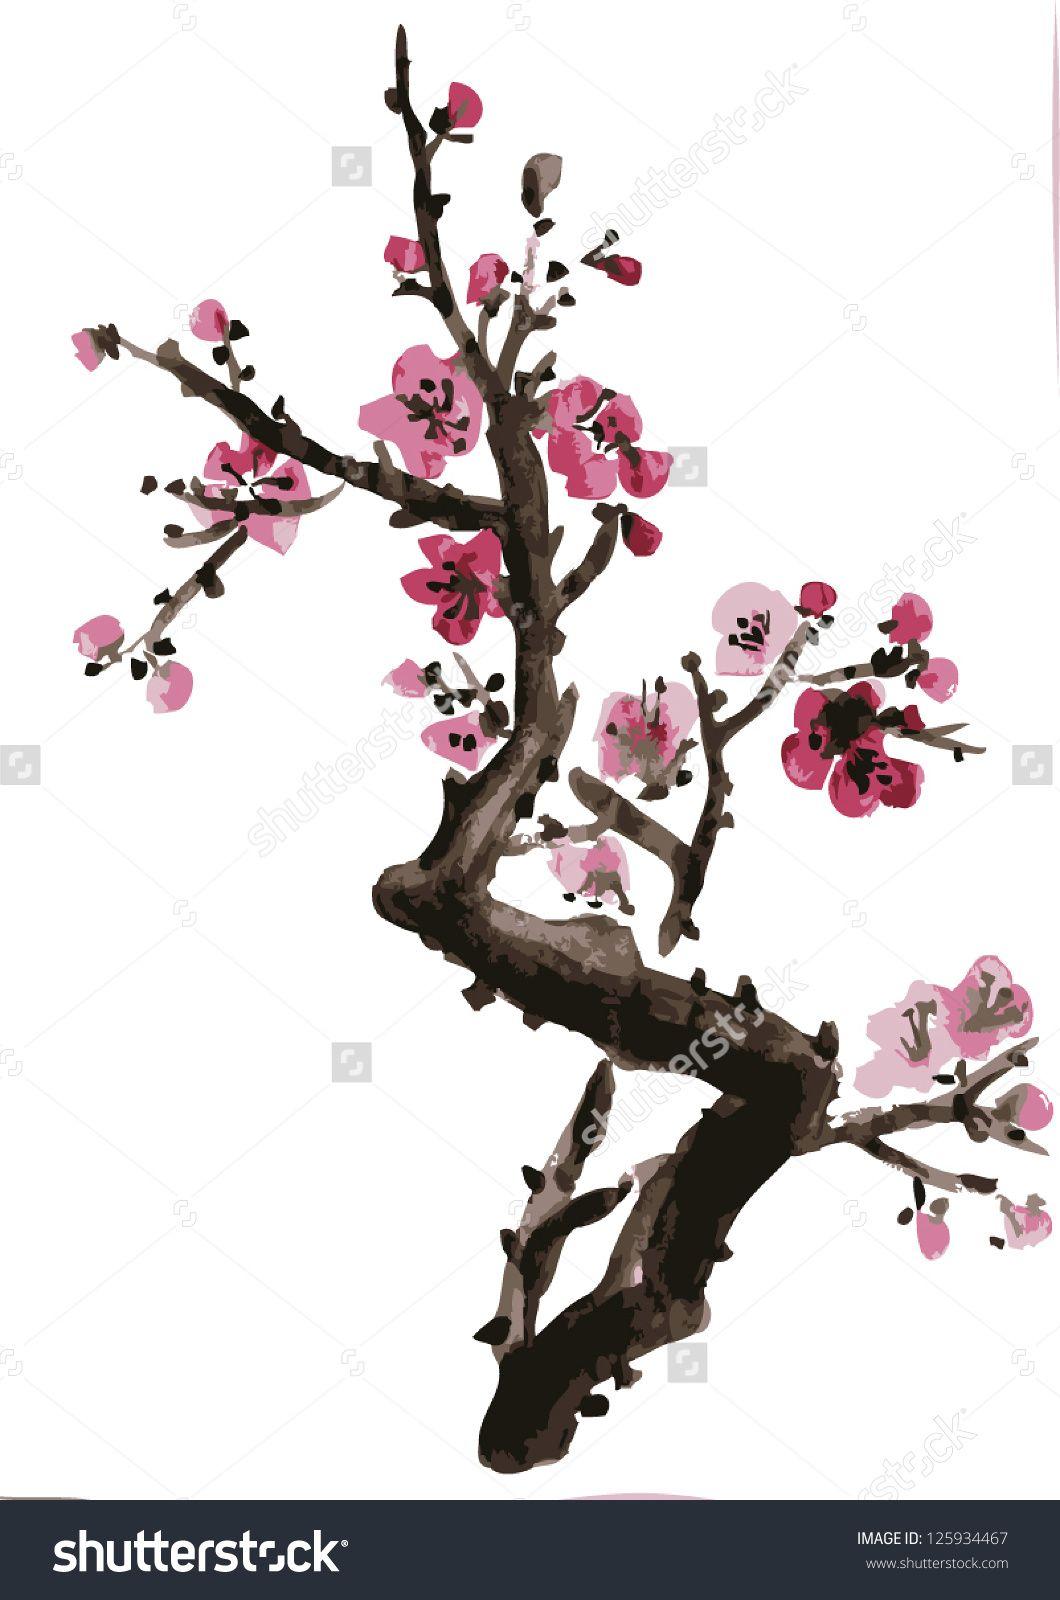 Stock Vector Realistic Sakura Blossom Japanese Cherry Tree Isolated On White Background Vectorizat Cherry Blossom Art Cherry Blossom Watercolor Sakura Painting